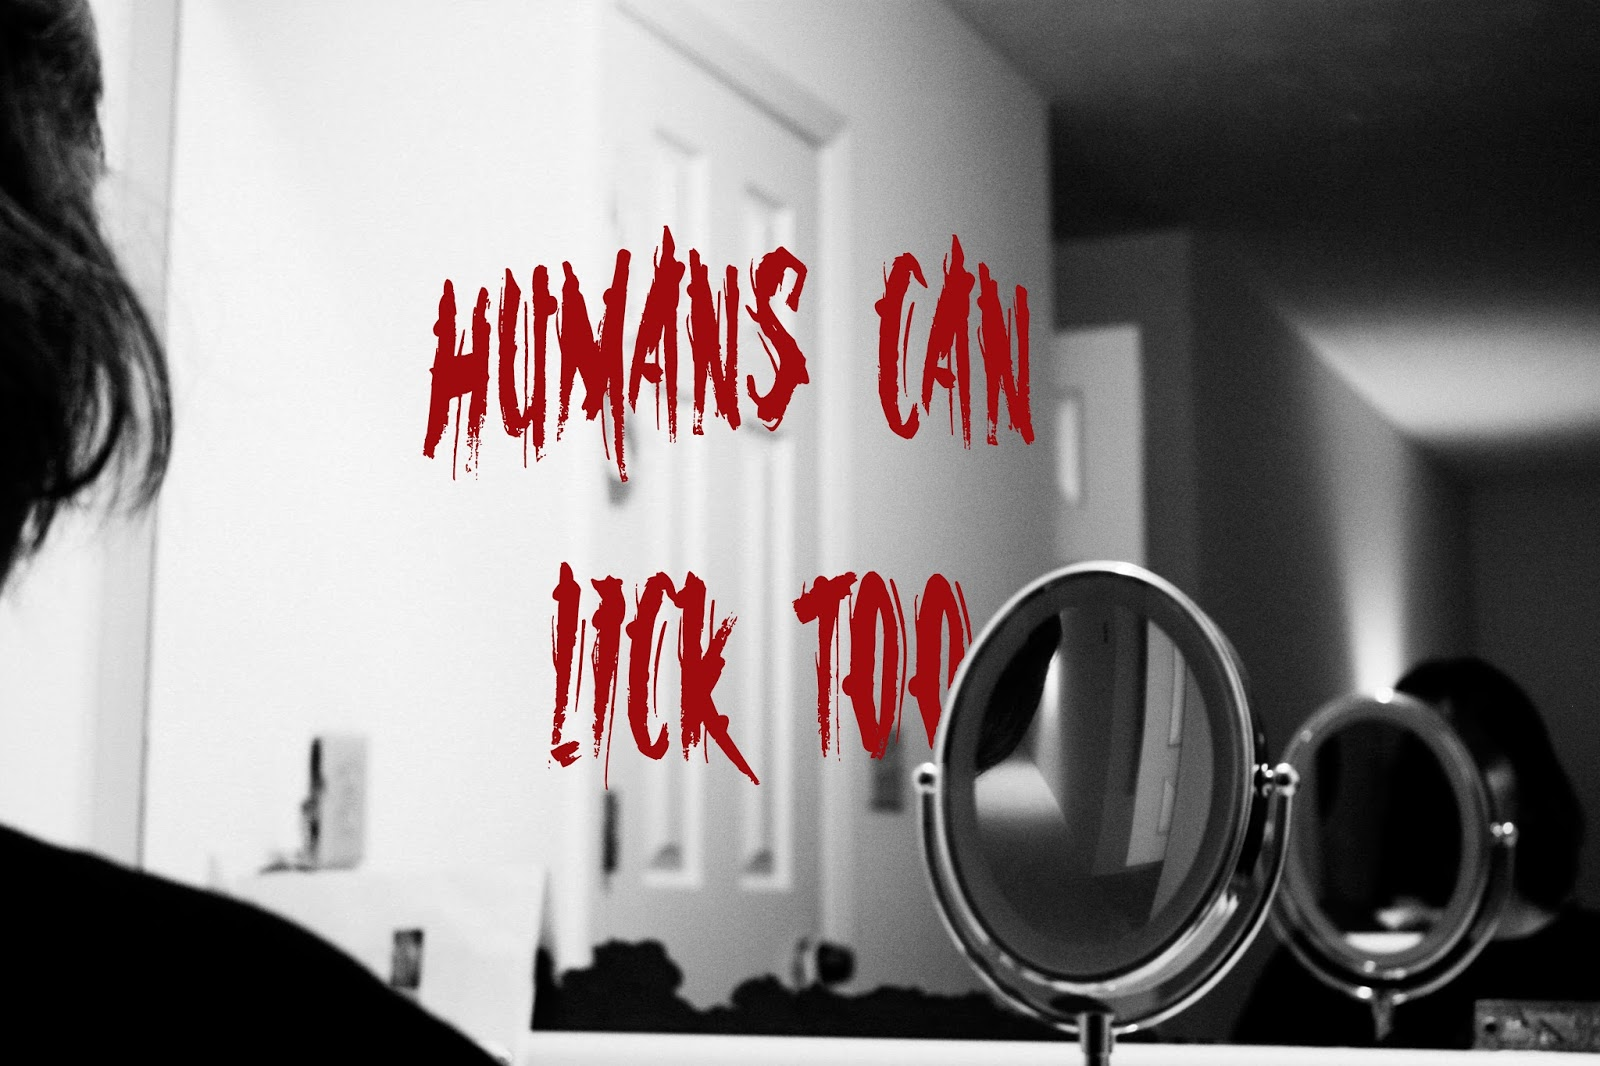 Humans lick hands too